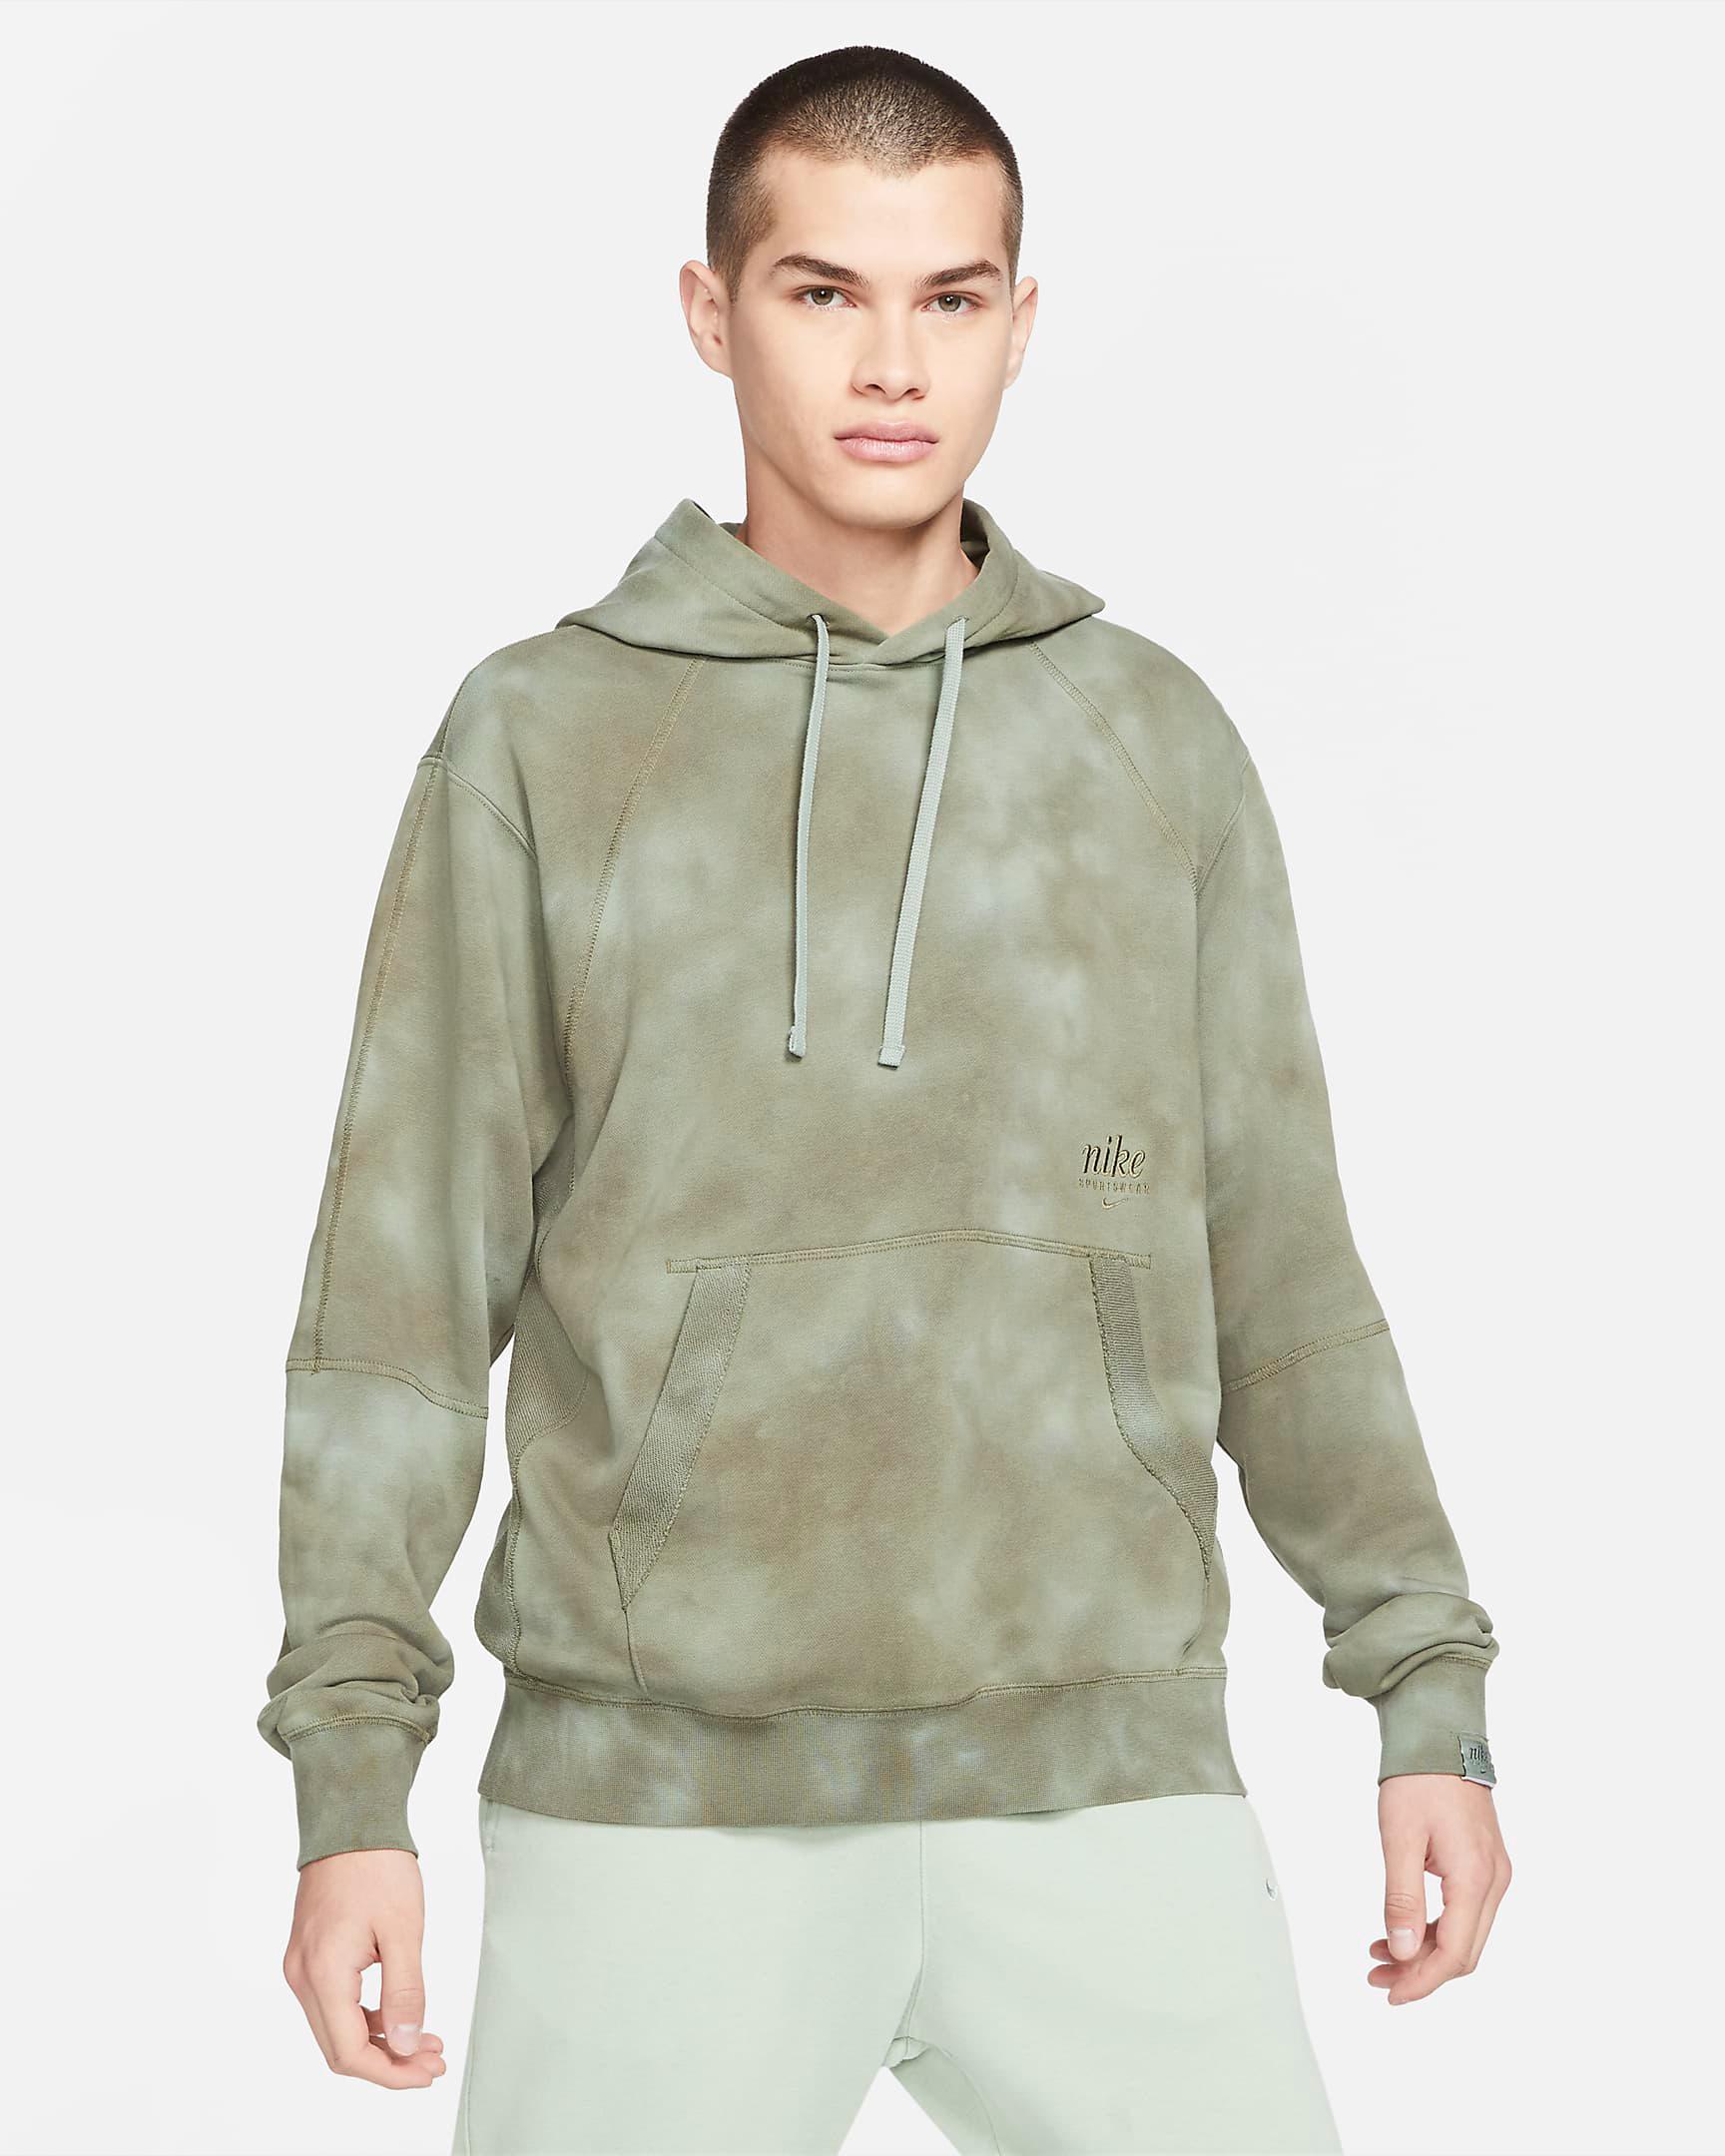 nike-club-fleece-tie-dye-hoodie-green-4